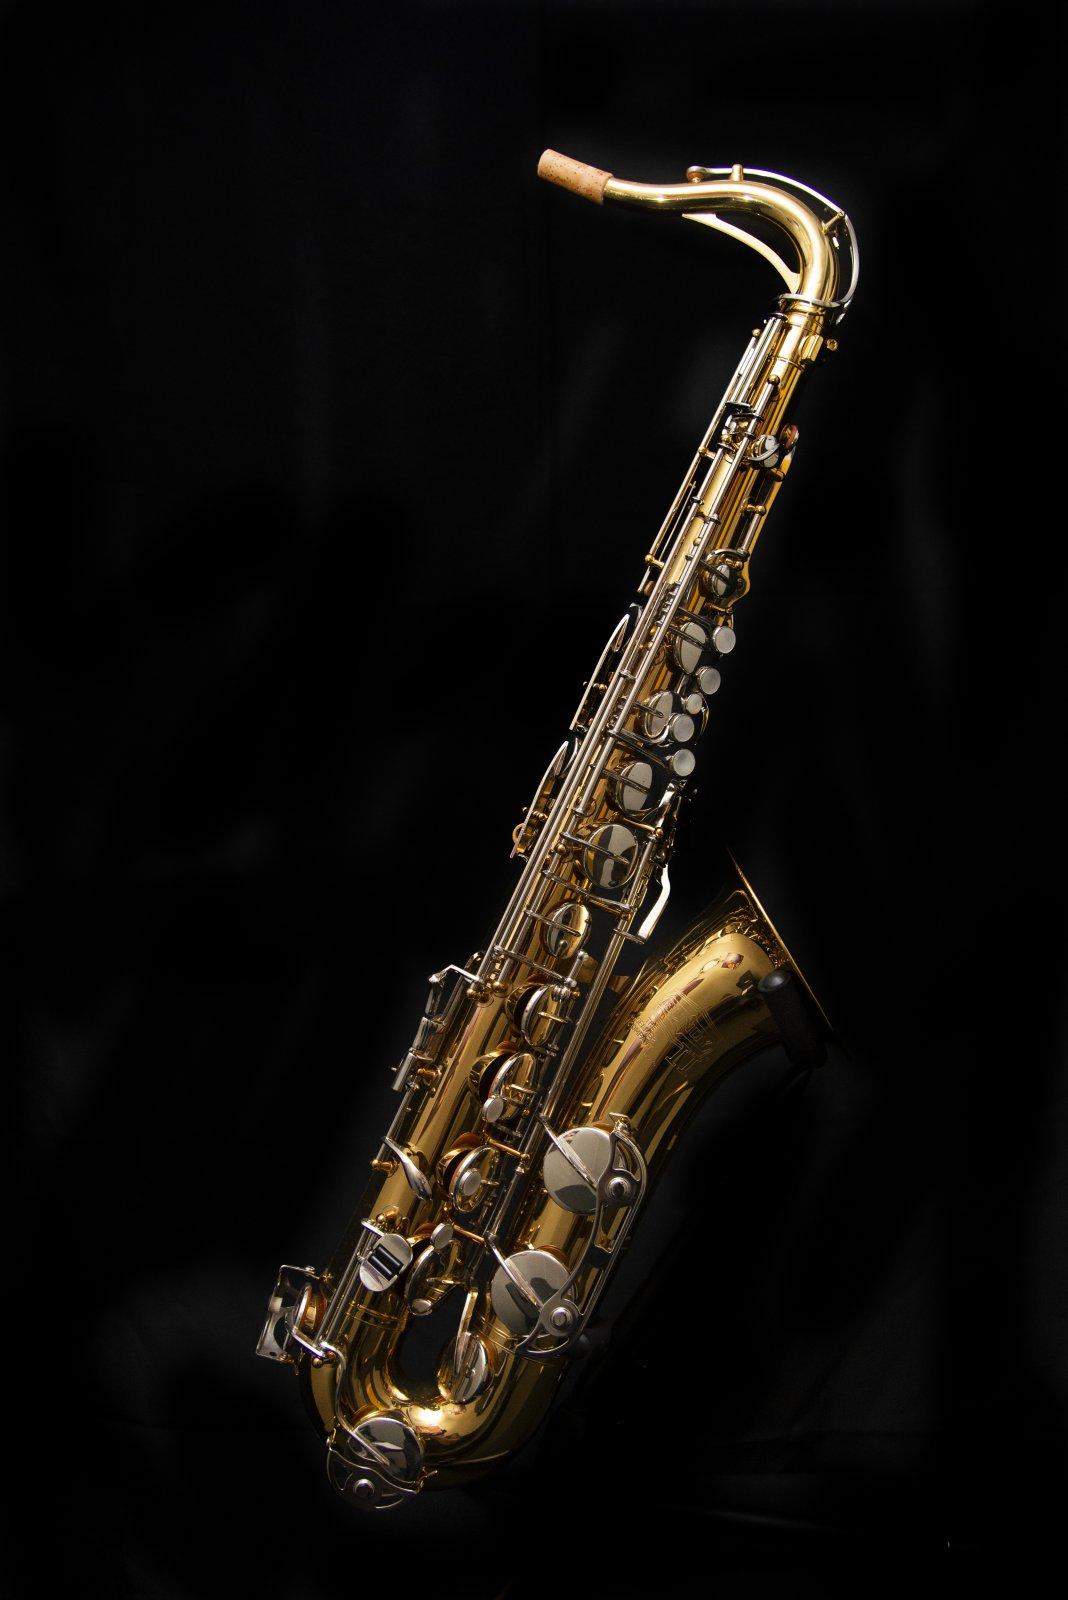 USED Bundy II Tenor Saxophone (NFS - LOANER ONLY)